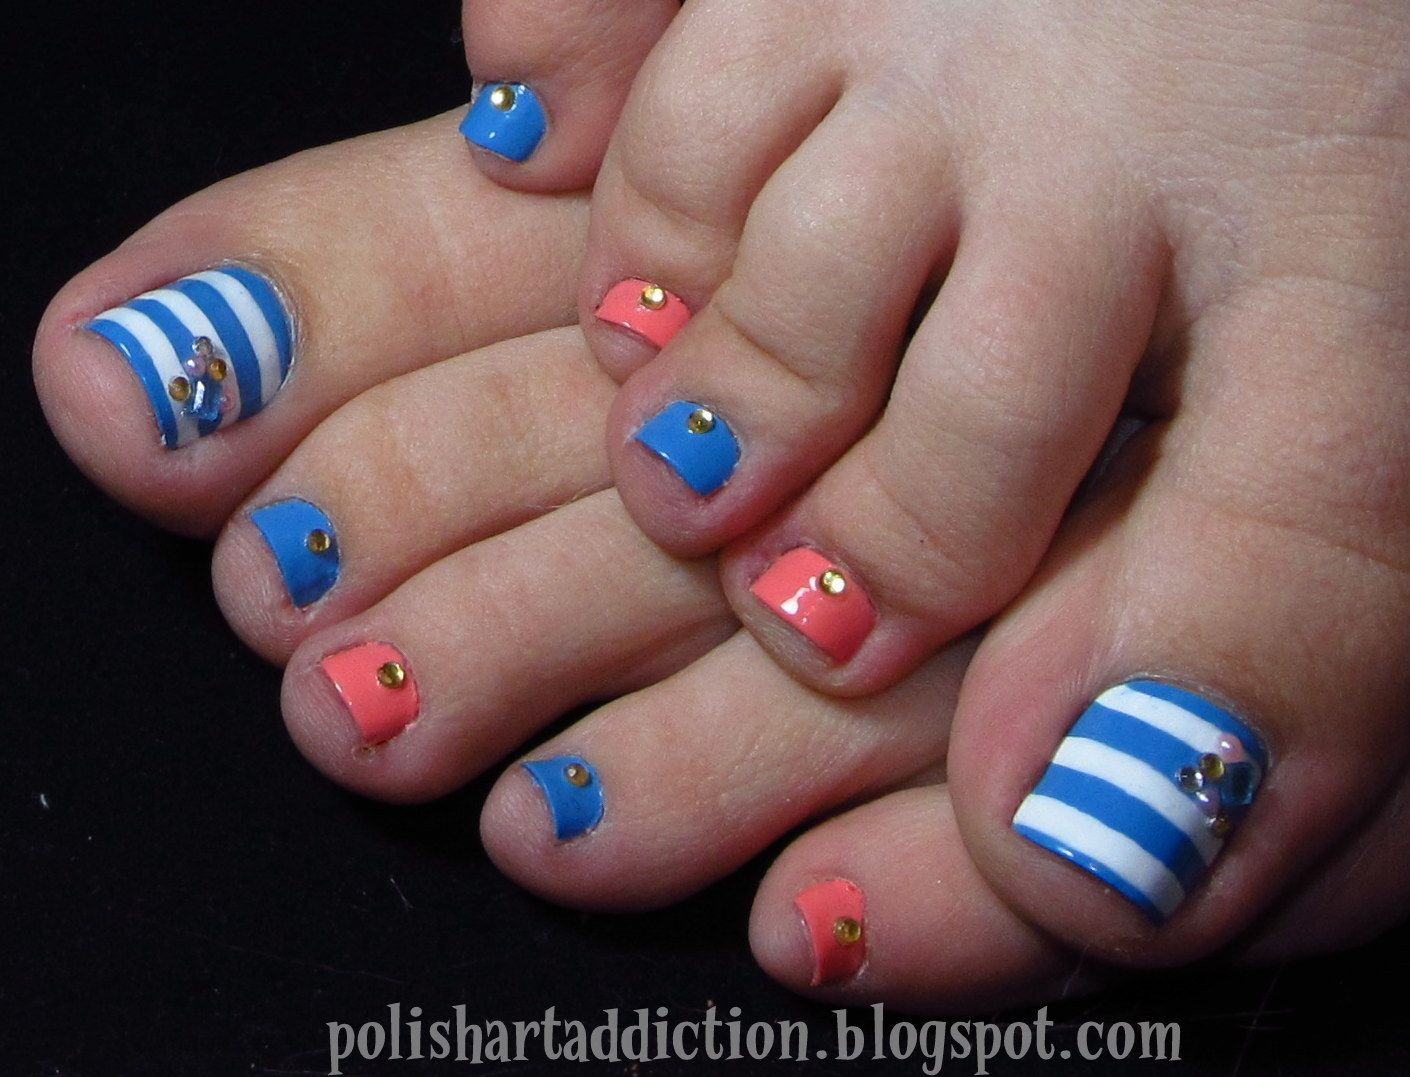 Toe Nail Designs Toe Nail Art Cool Striped Toe Nail Art Design